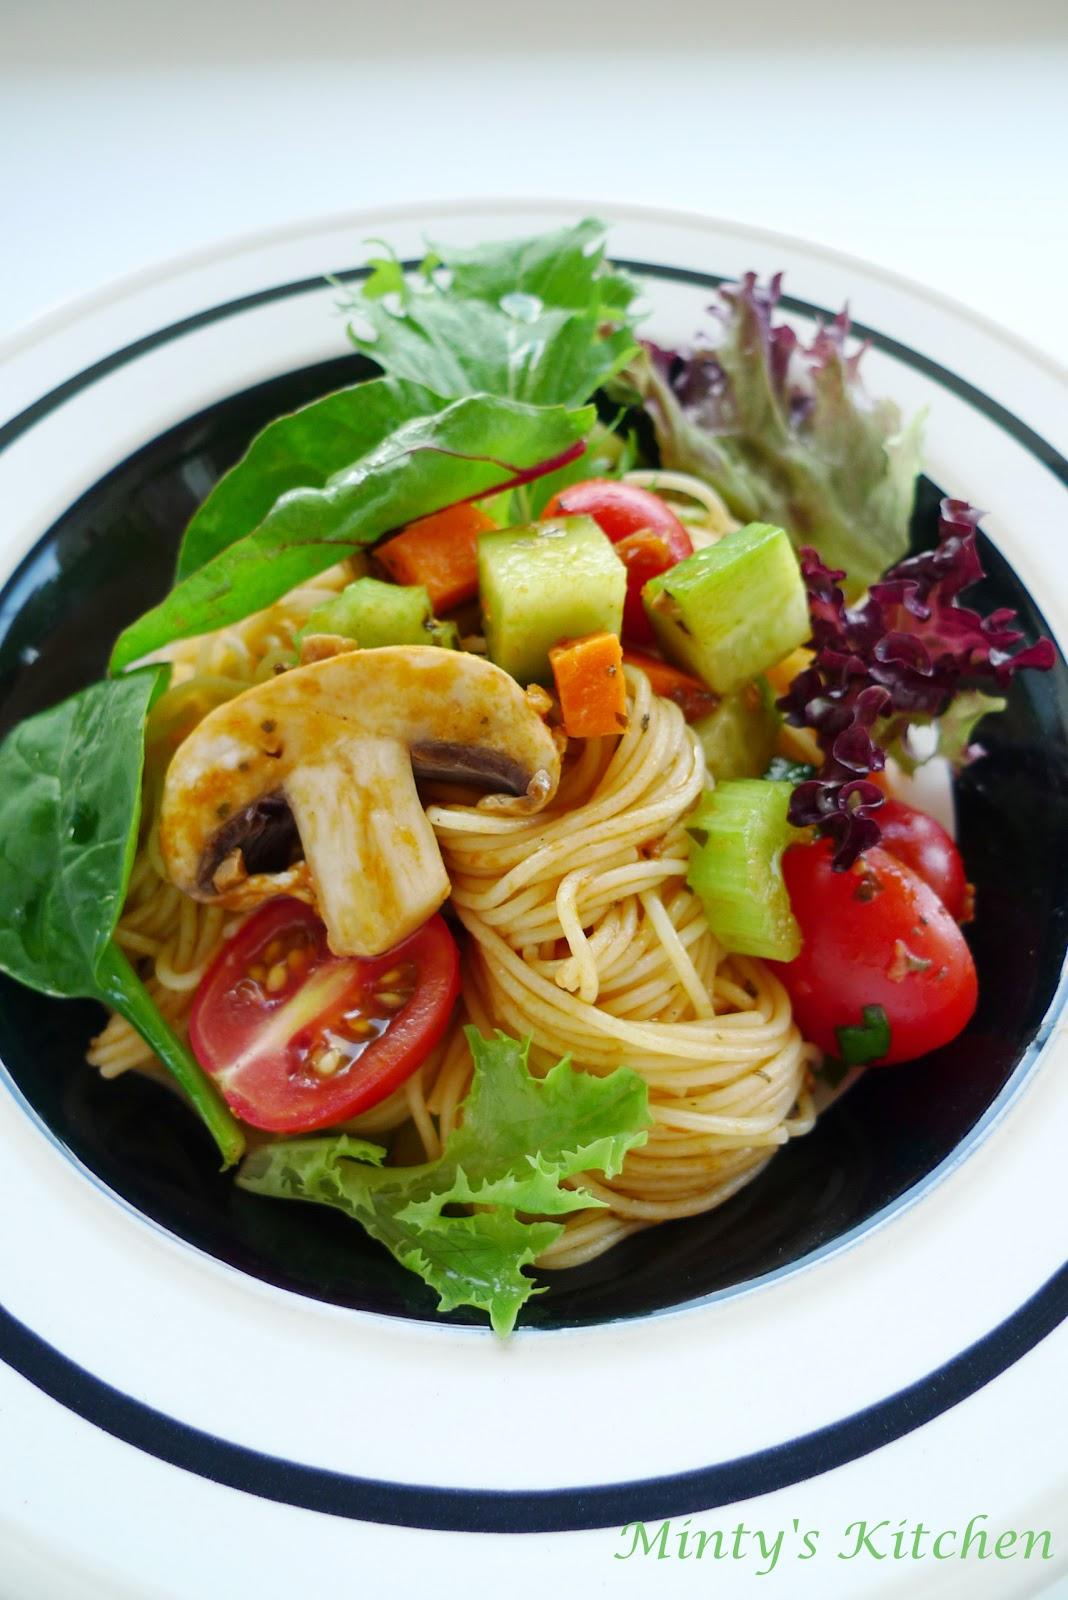 minty's kitchen sundried tomato pesto pasta salad